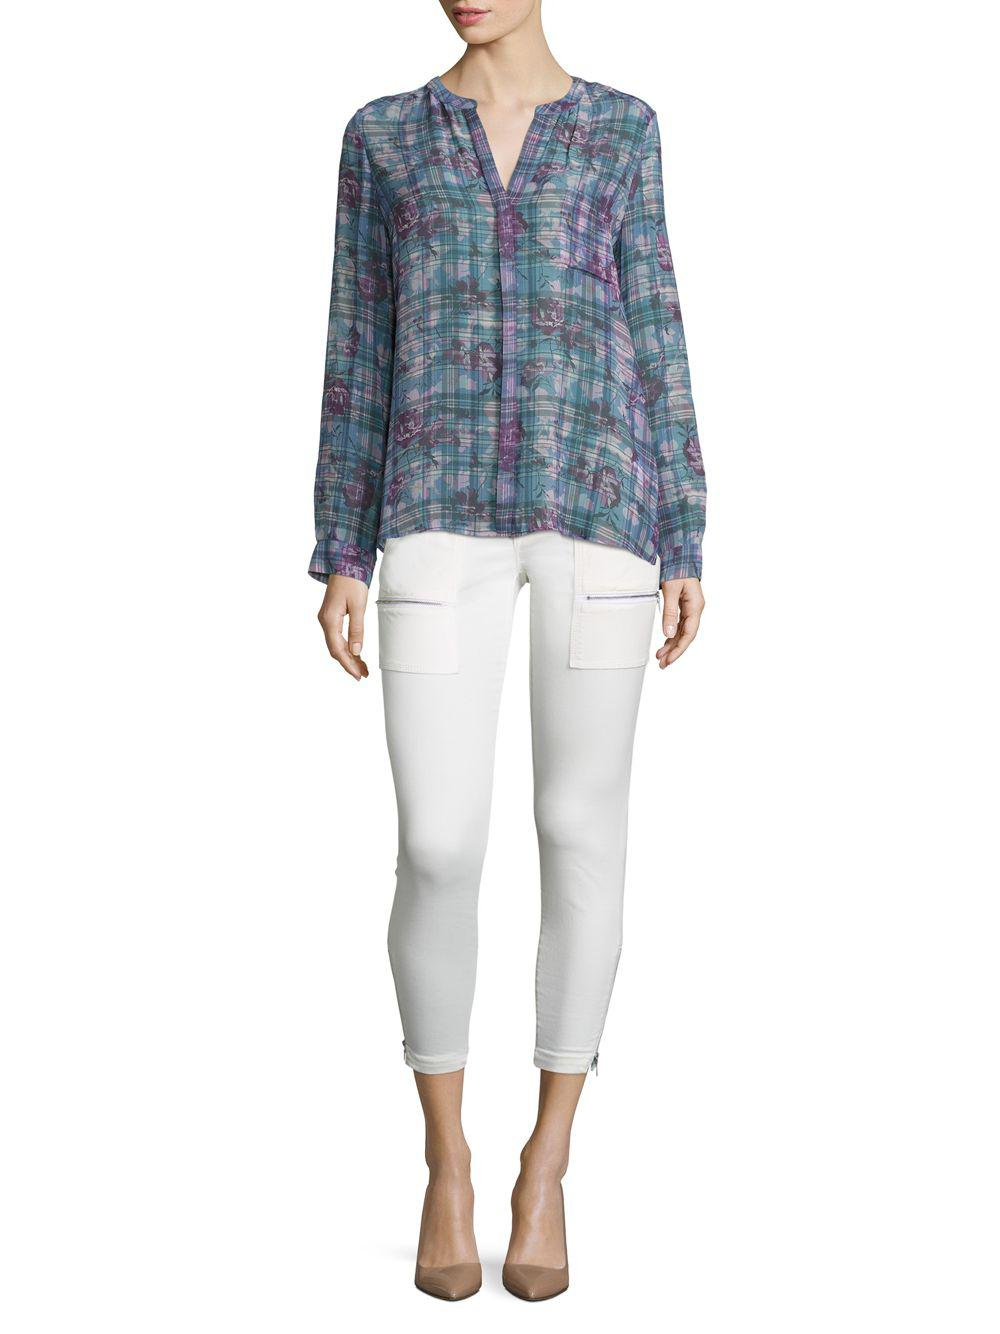 01622438 Lyst - Joie Brigid C Floral & Plaid Silk Blouse in Blue